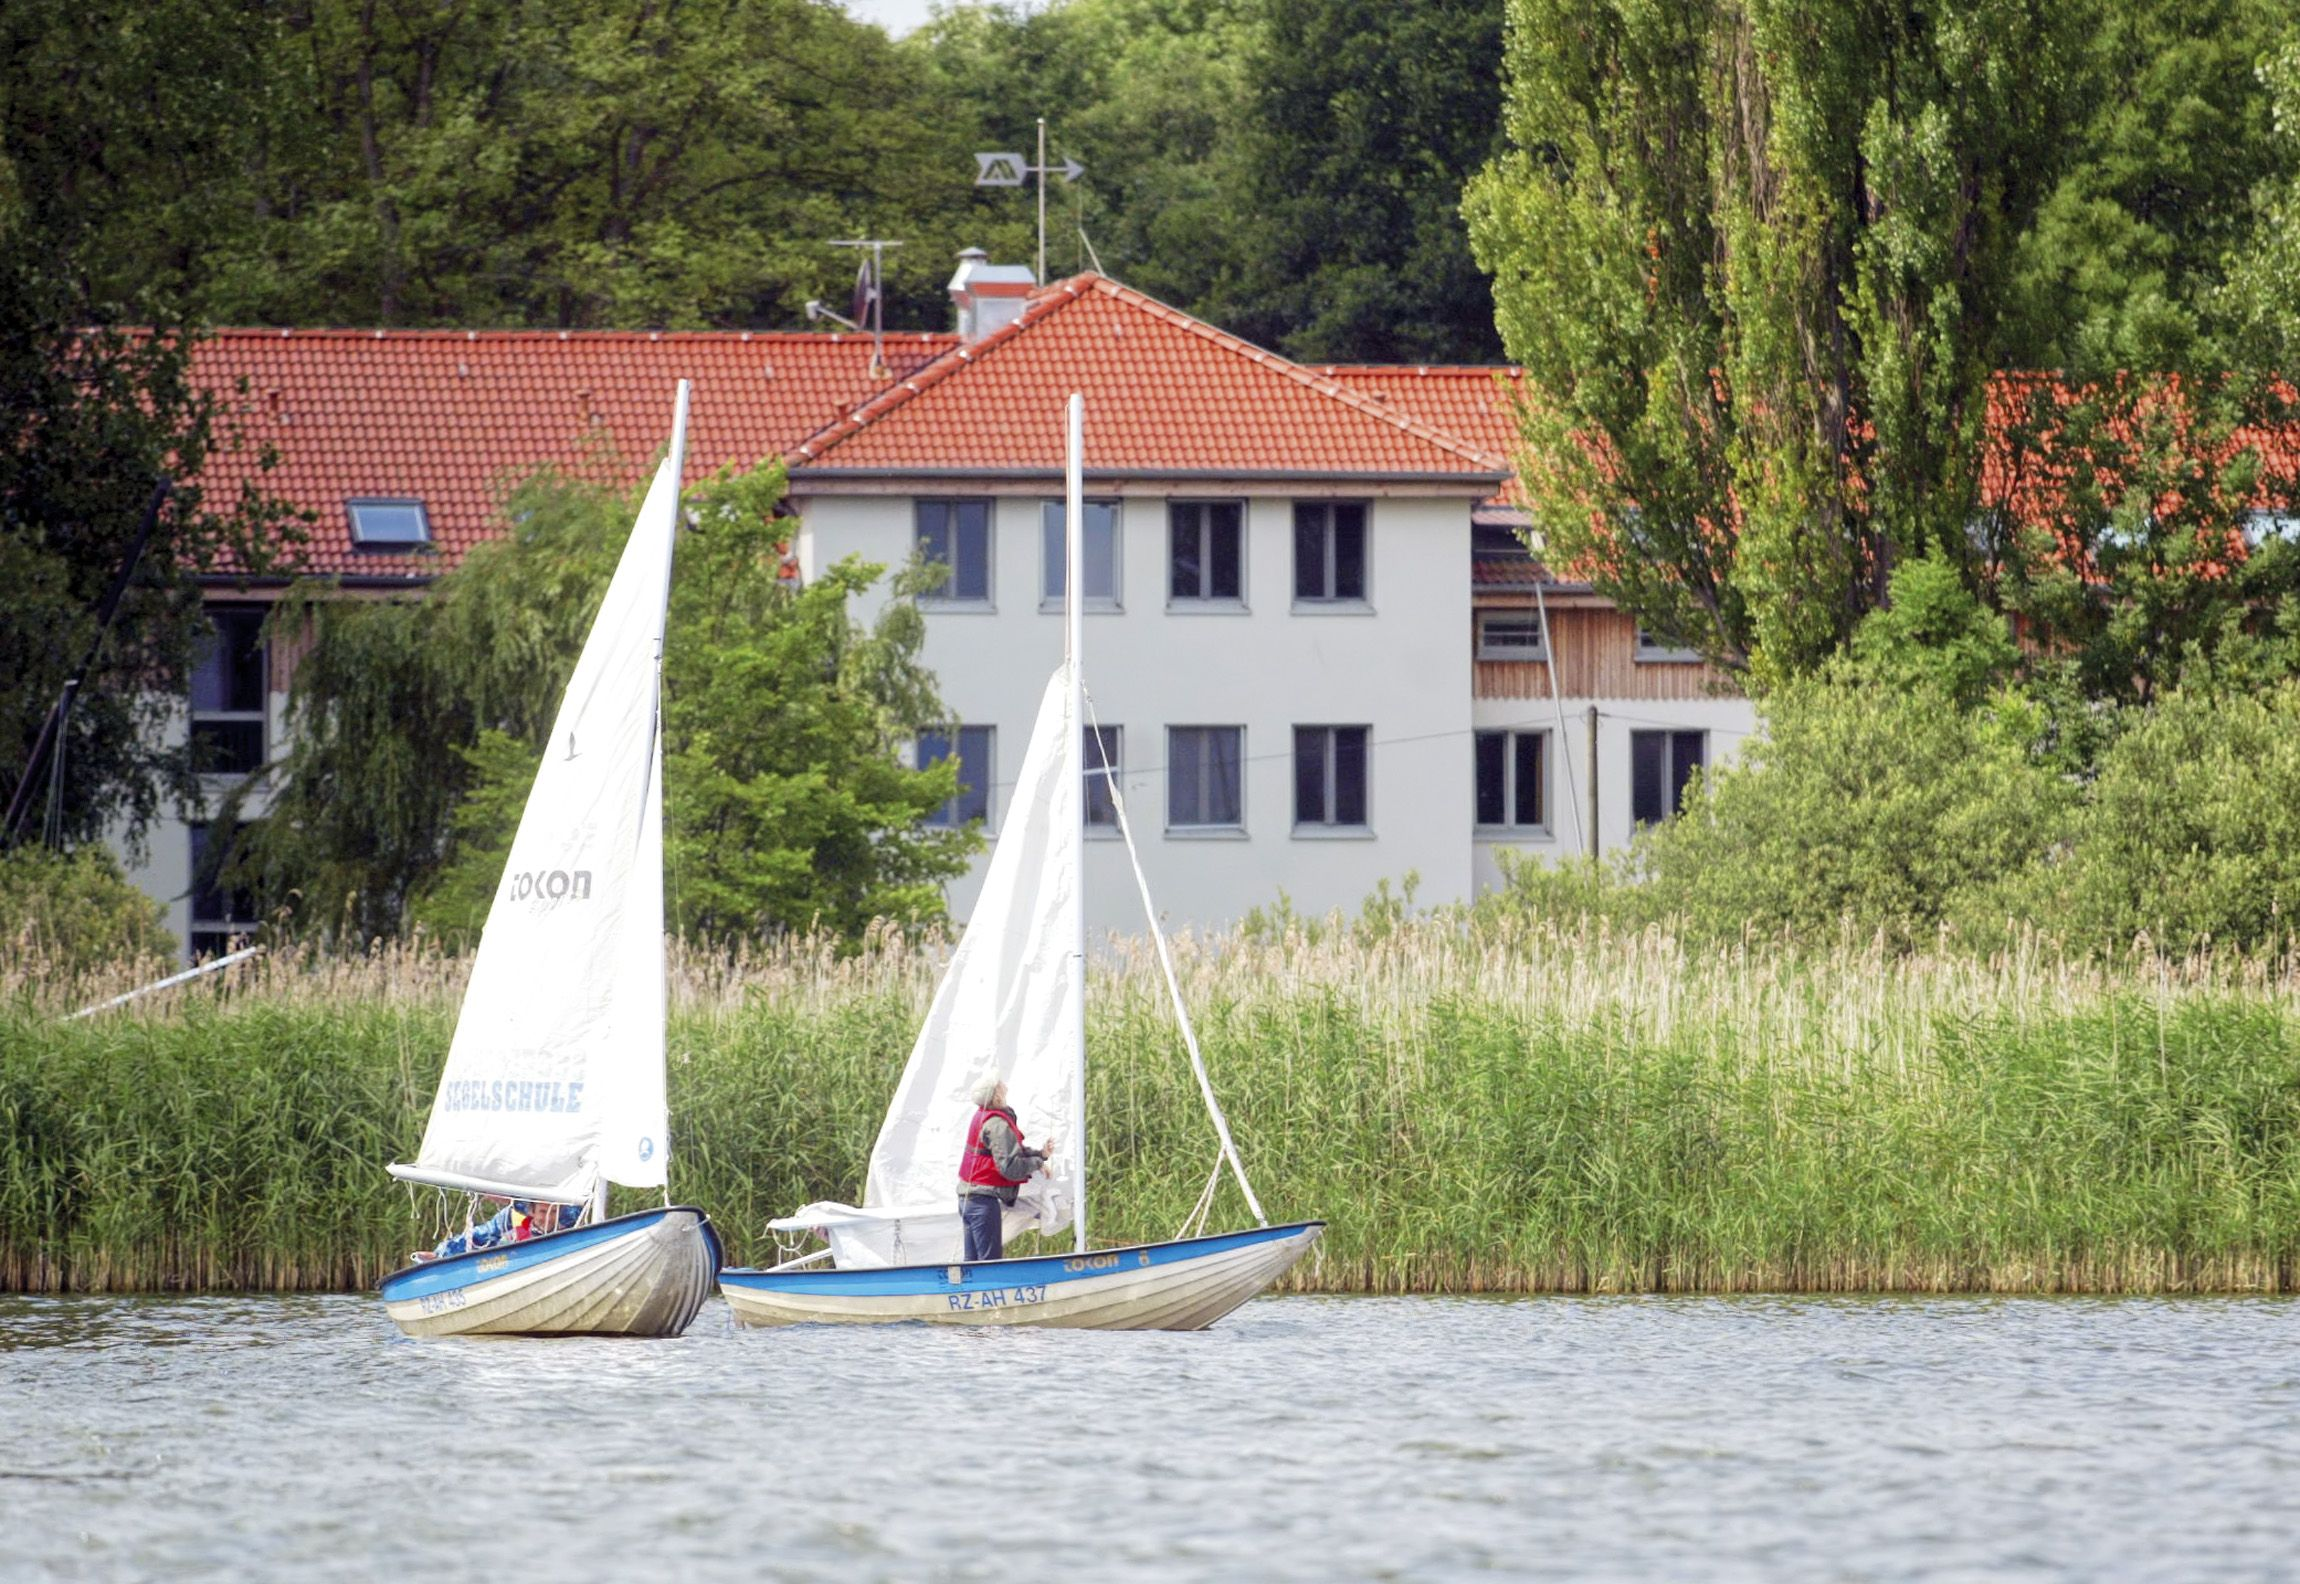 Jugendherberge Waren Müritz Die Jugendherbergen in Mecklenburg Vorpommern Pinterest